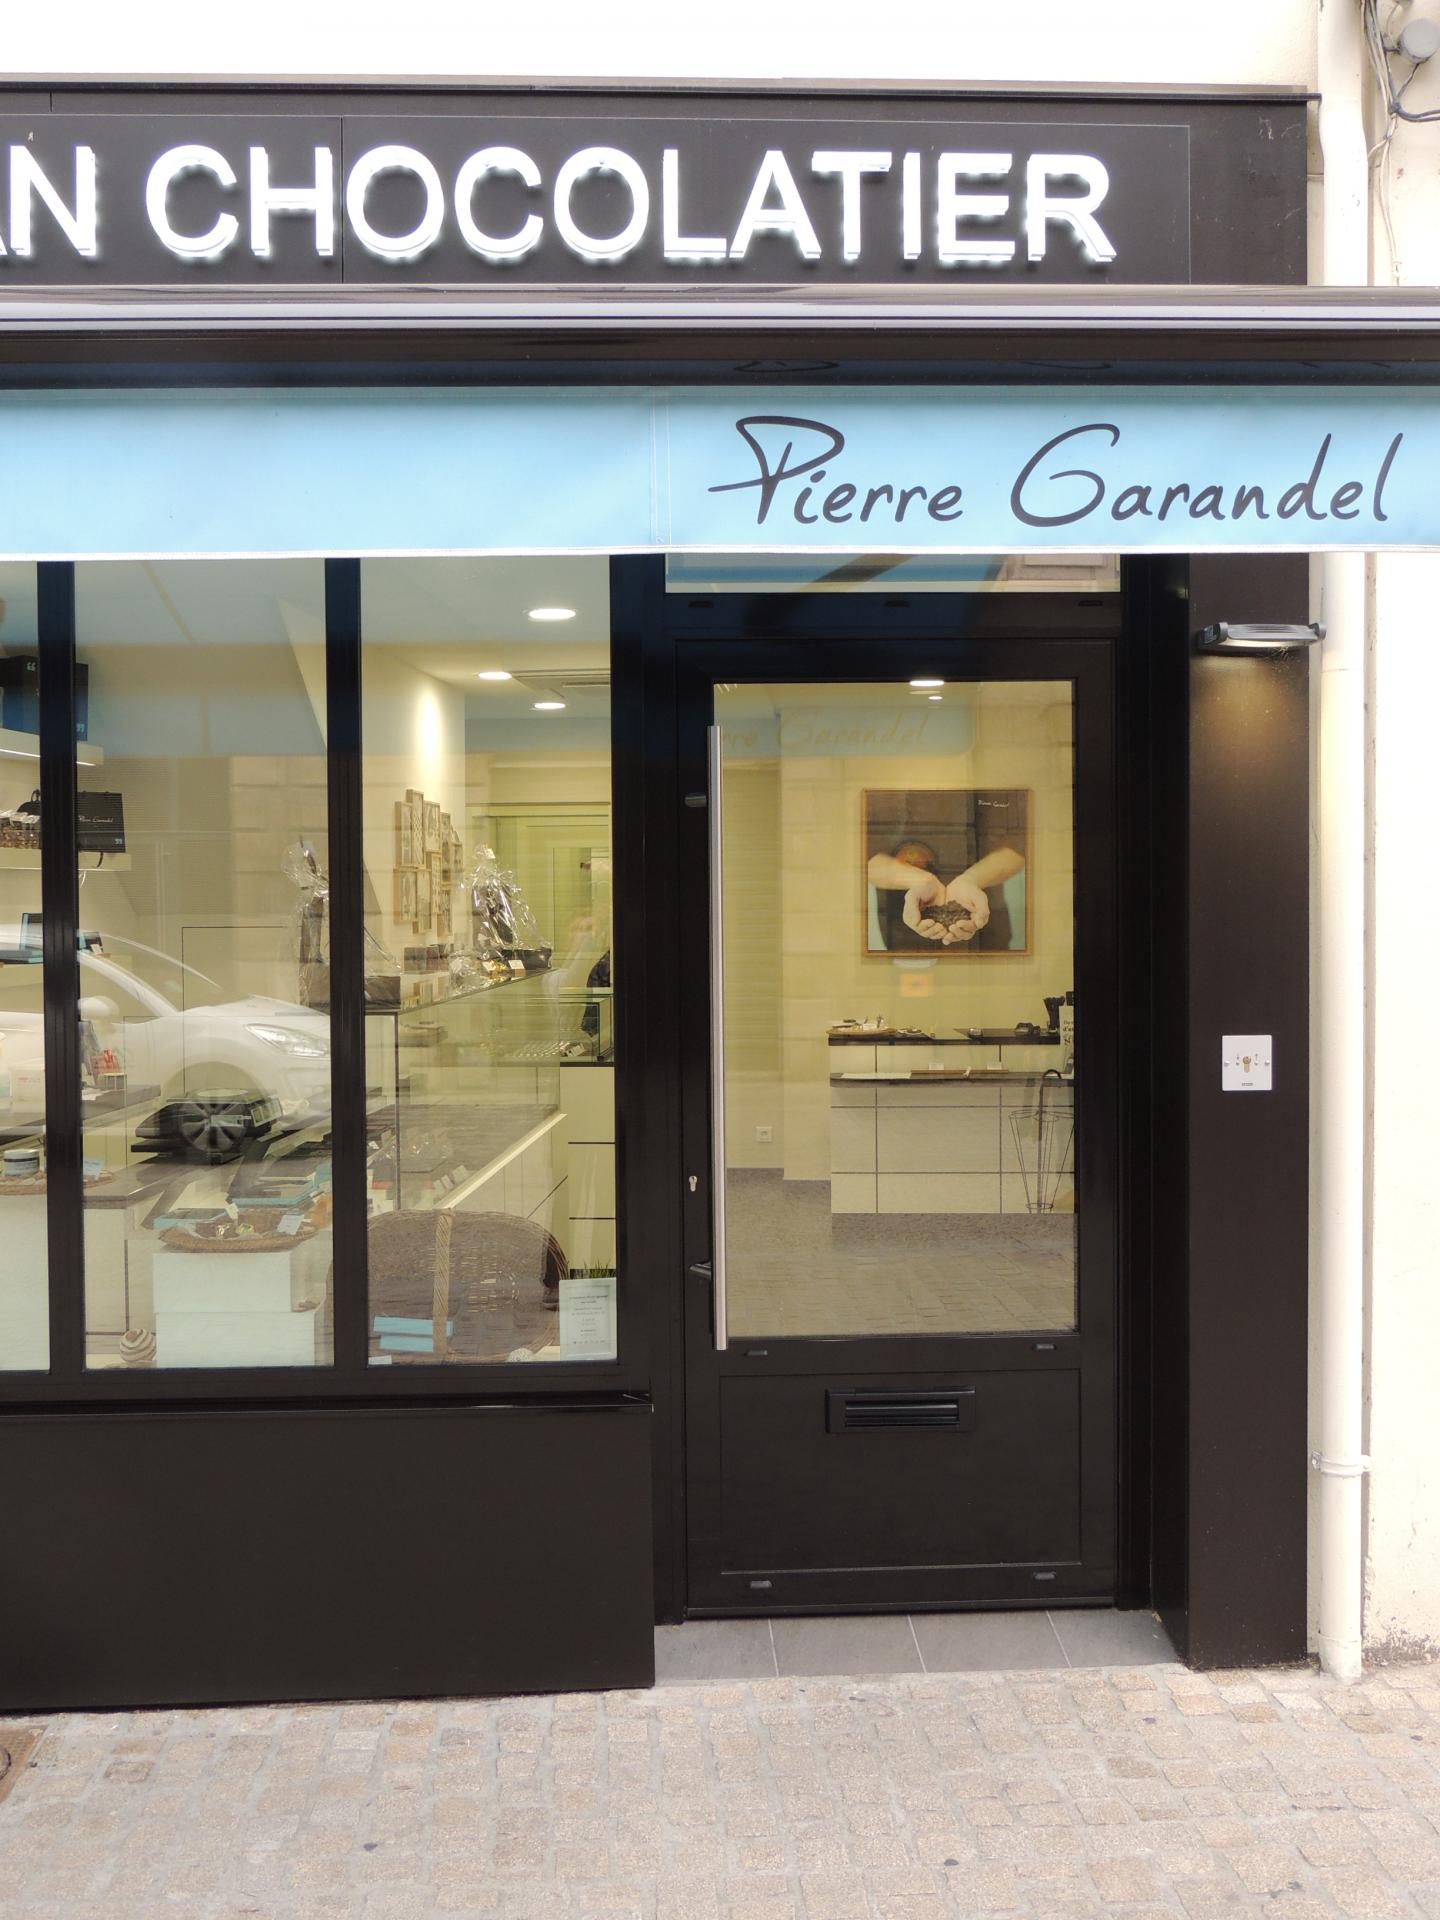 Boutique Pierre Grandel chocolatier Niort